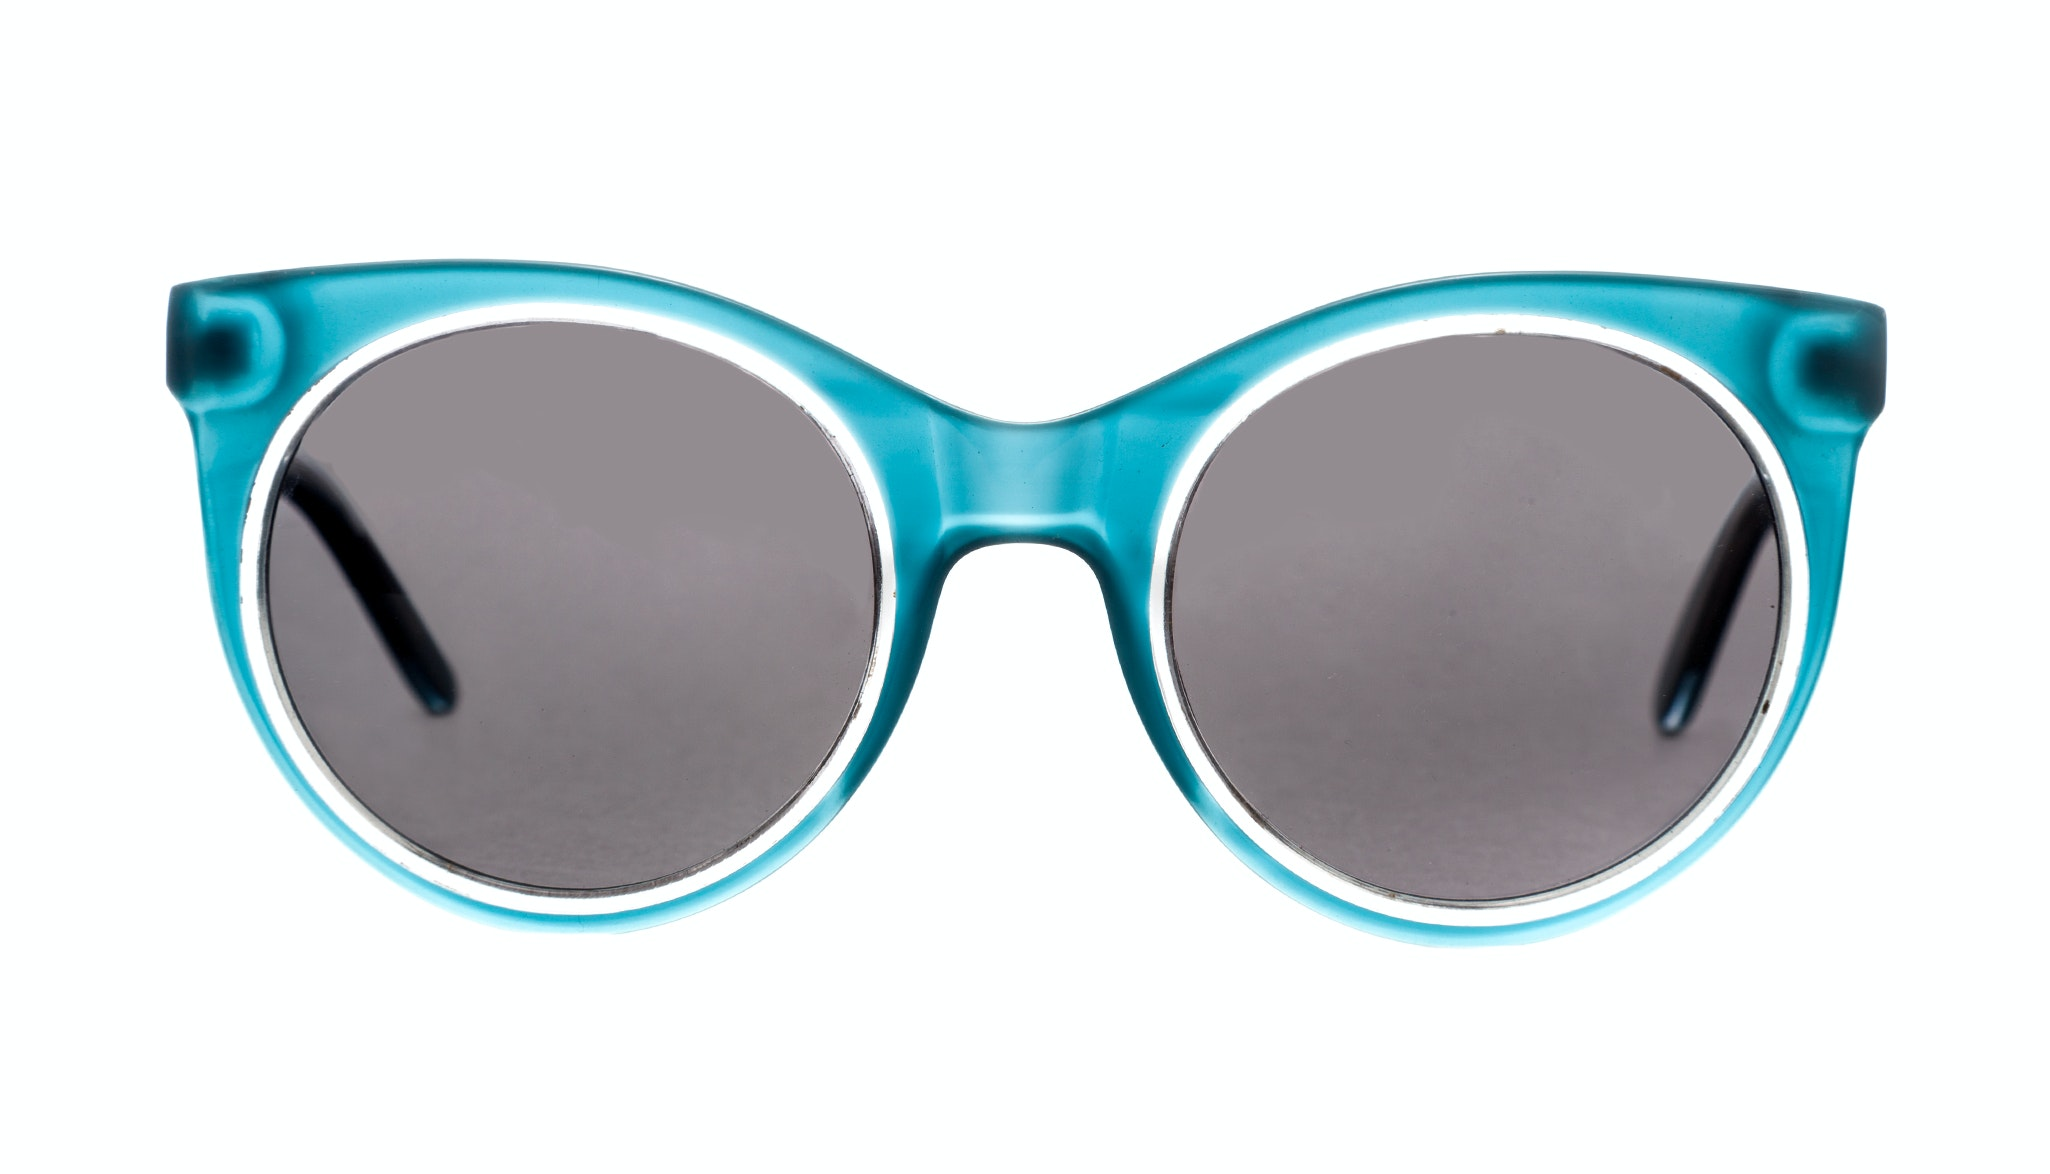 Affordable Fashion Glasses Cat Eye Round Sunglasses Women Pop Iceberg